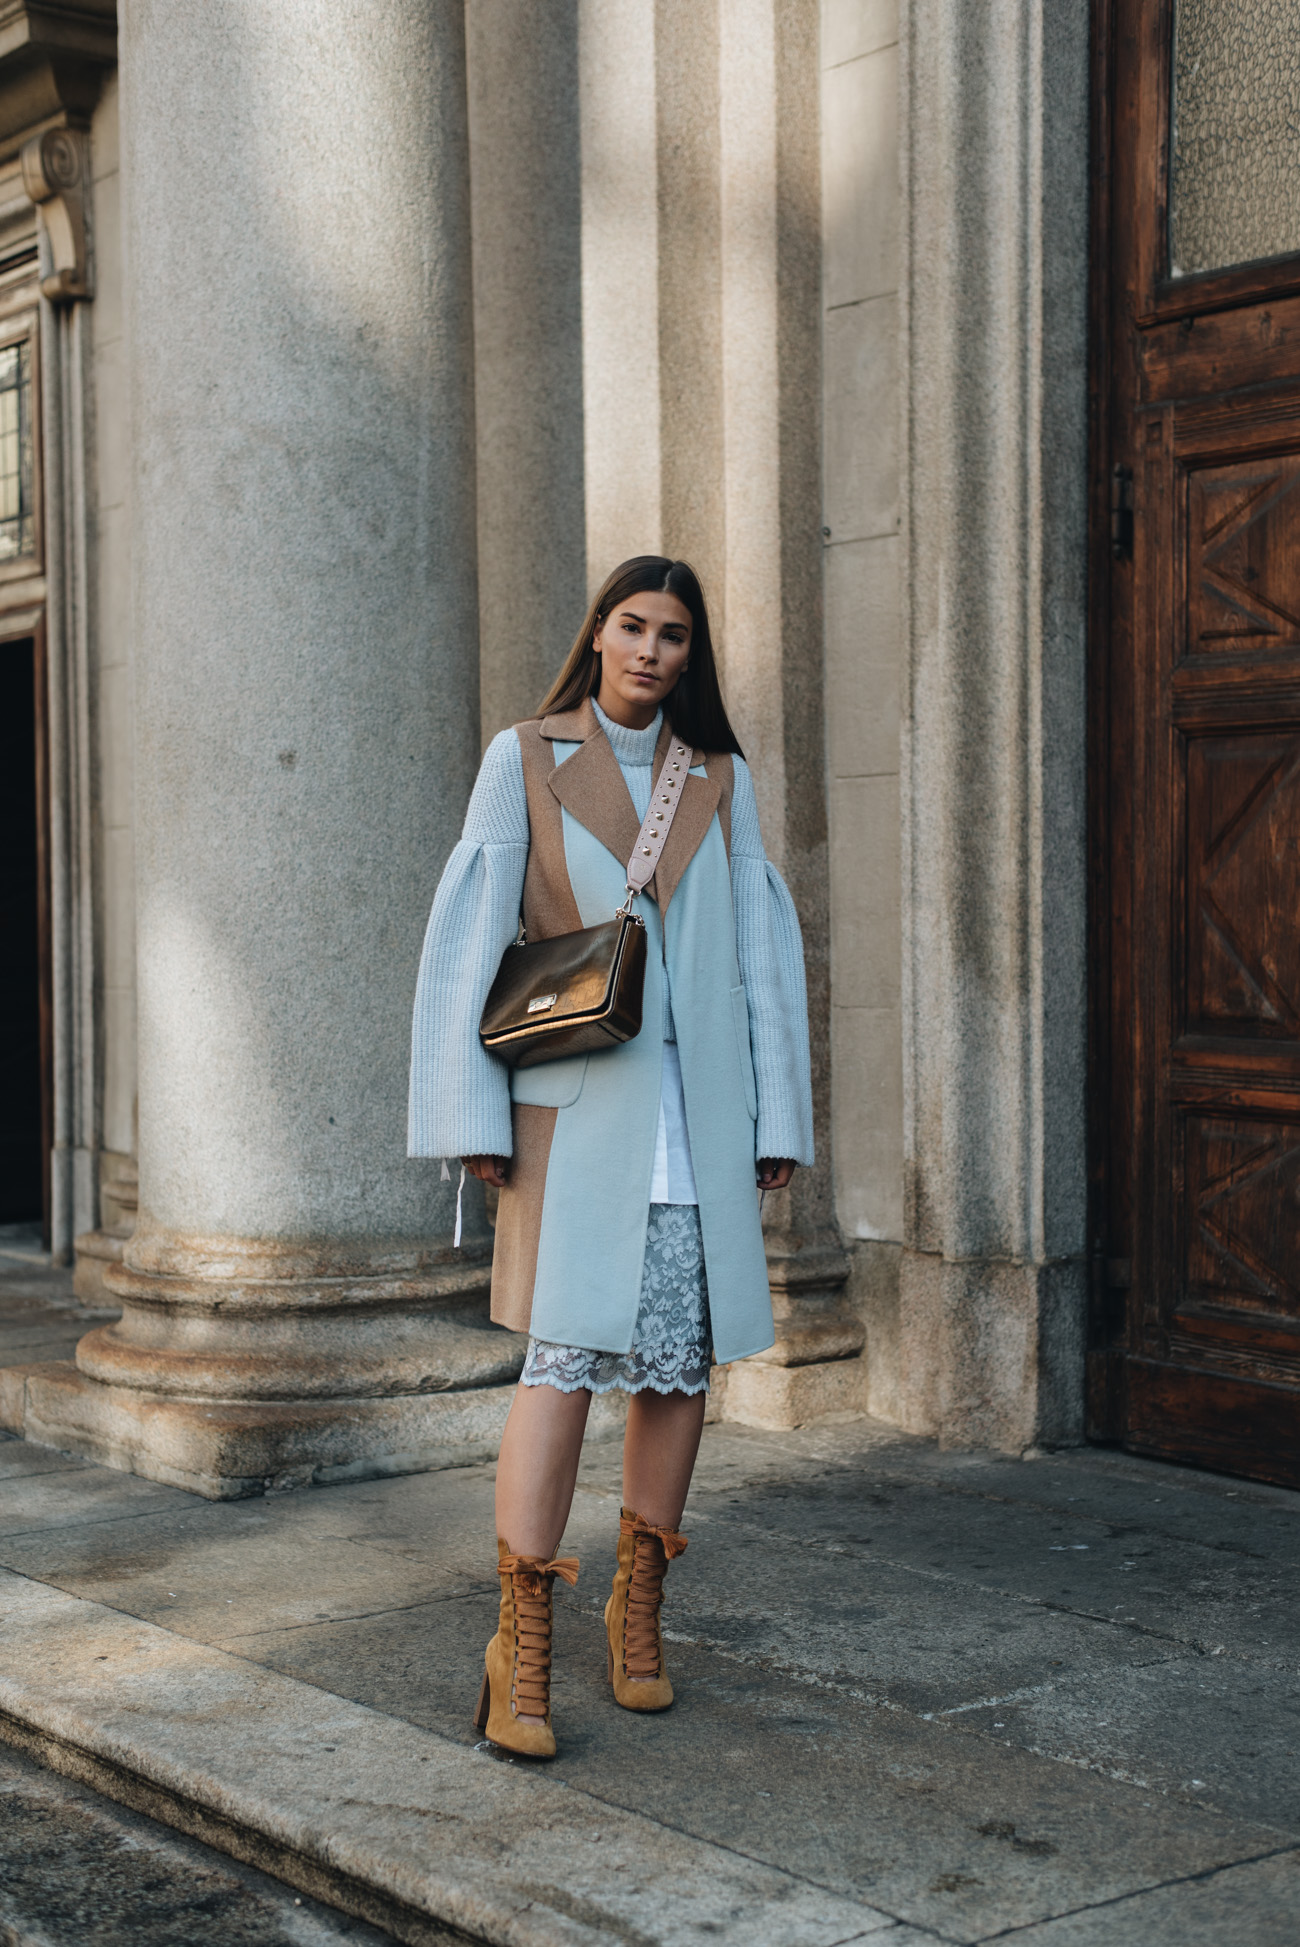 fashion-editorial-shooting-blogger-mailand-architektur-streetstyle-high-fashion-outdoor-fashiioncarpet-nina-schwichtenberg